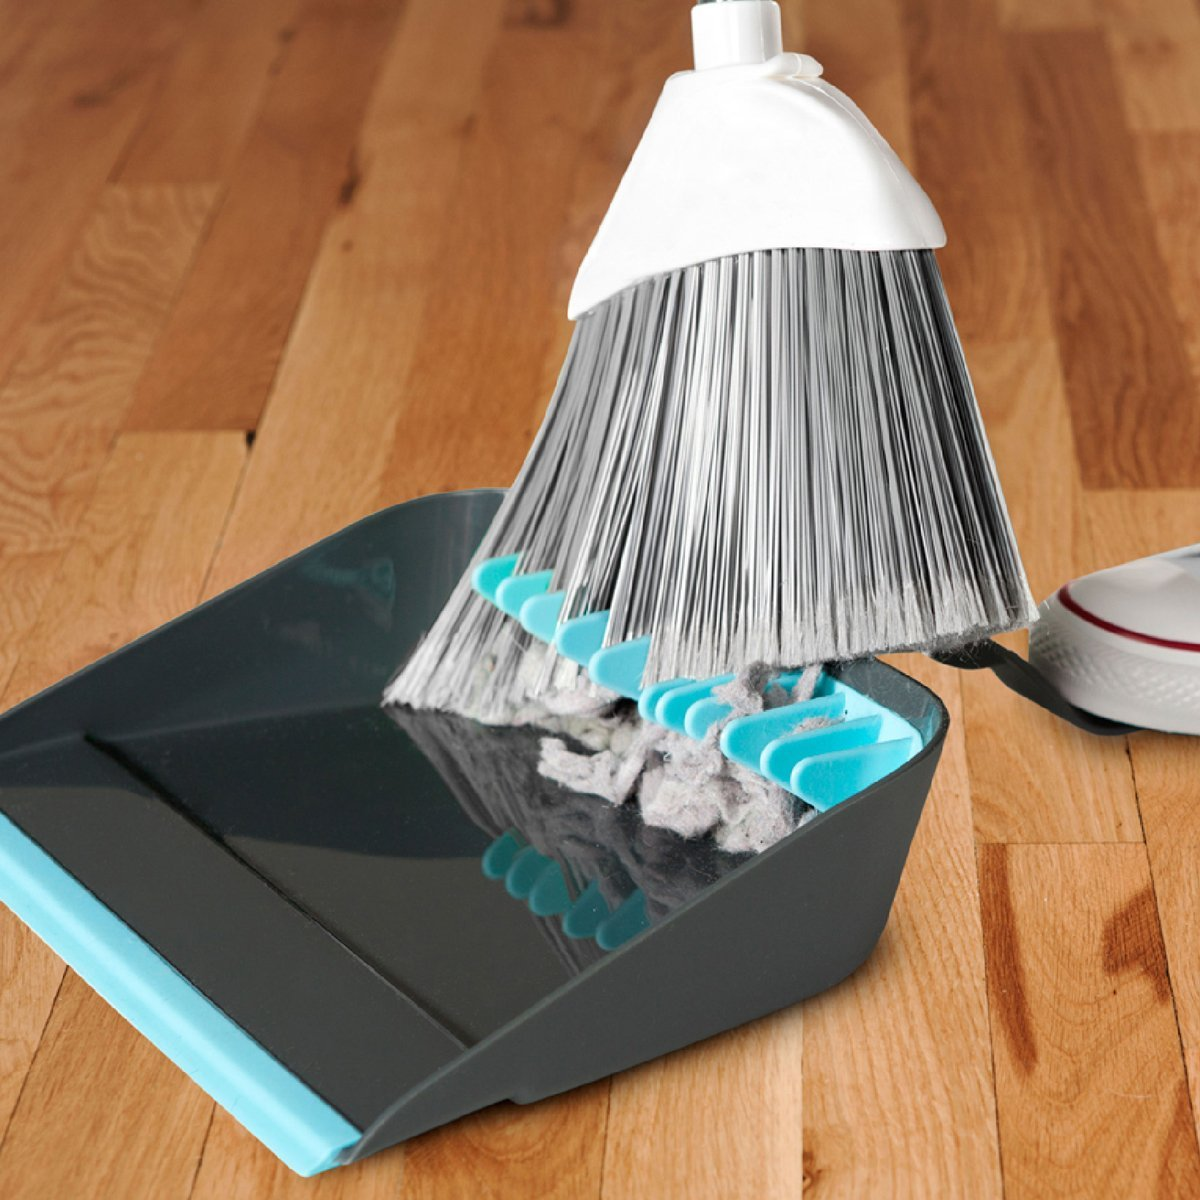 1471372935-lazy-cleaner-broom